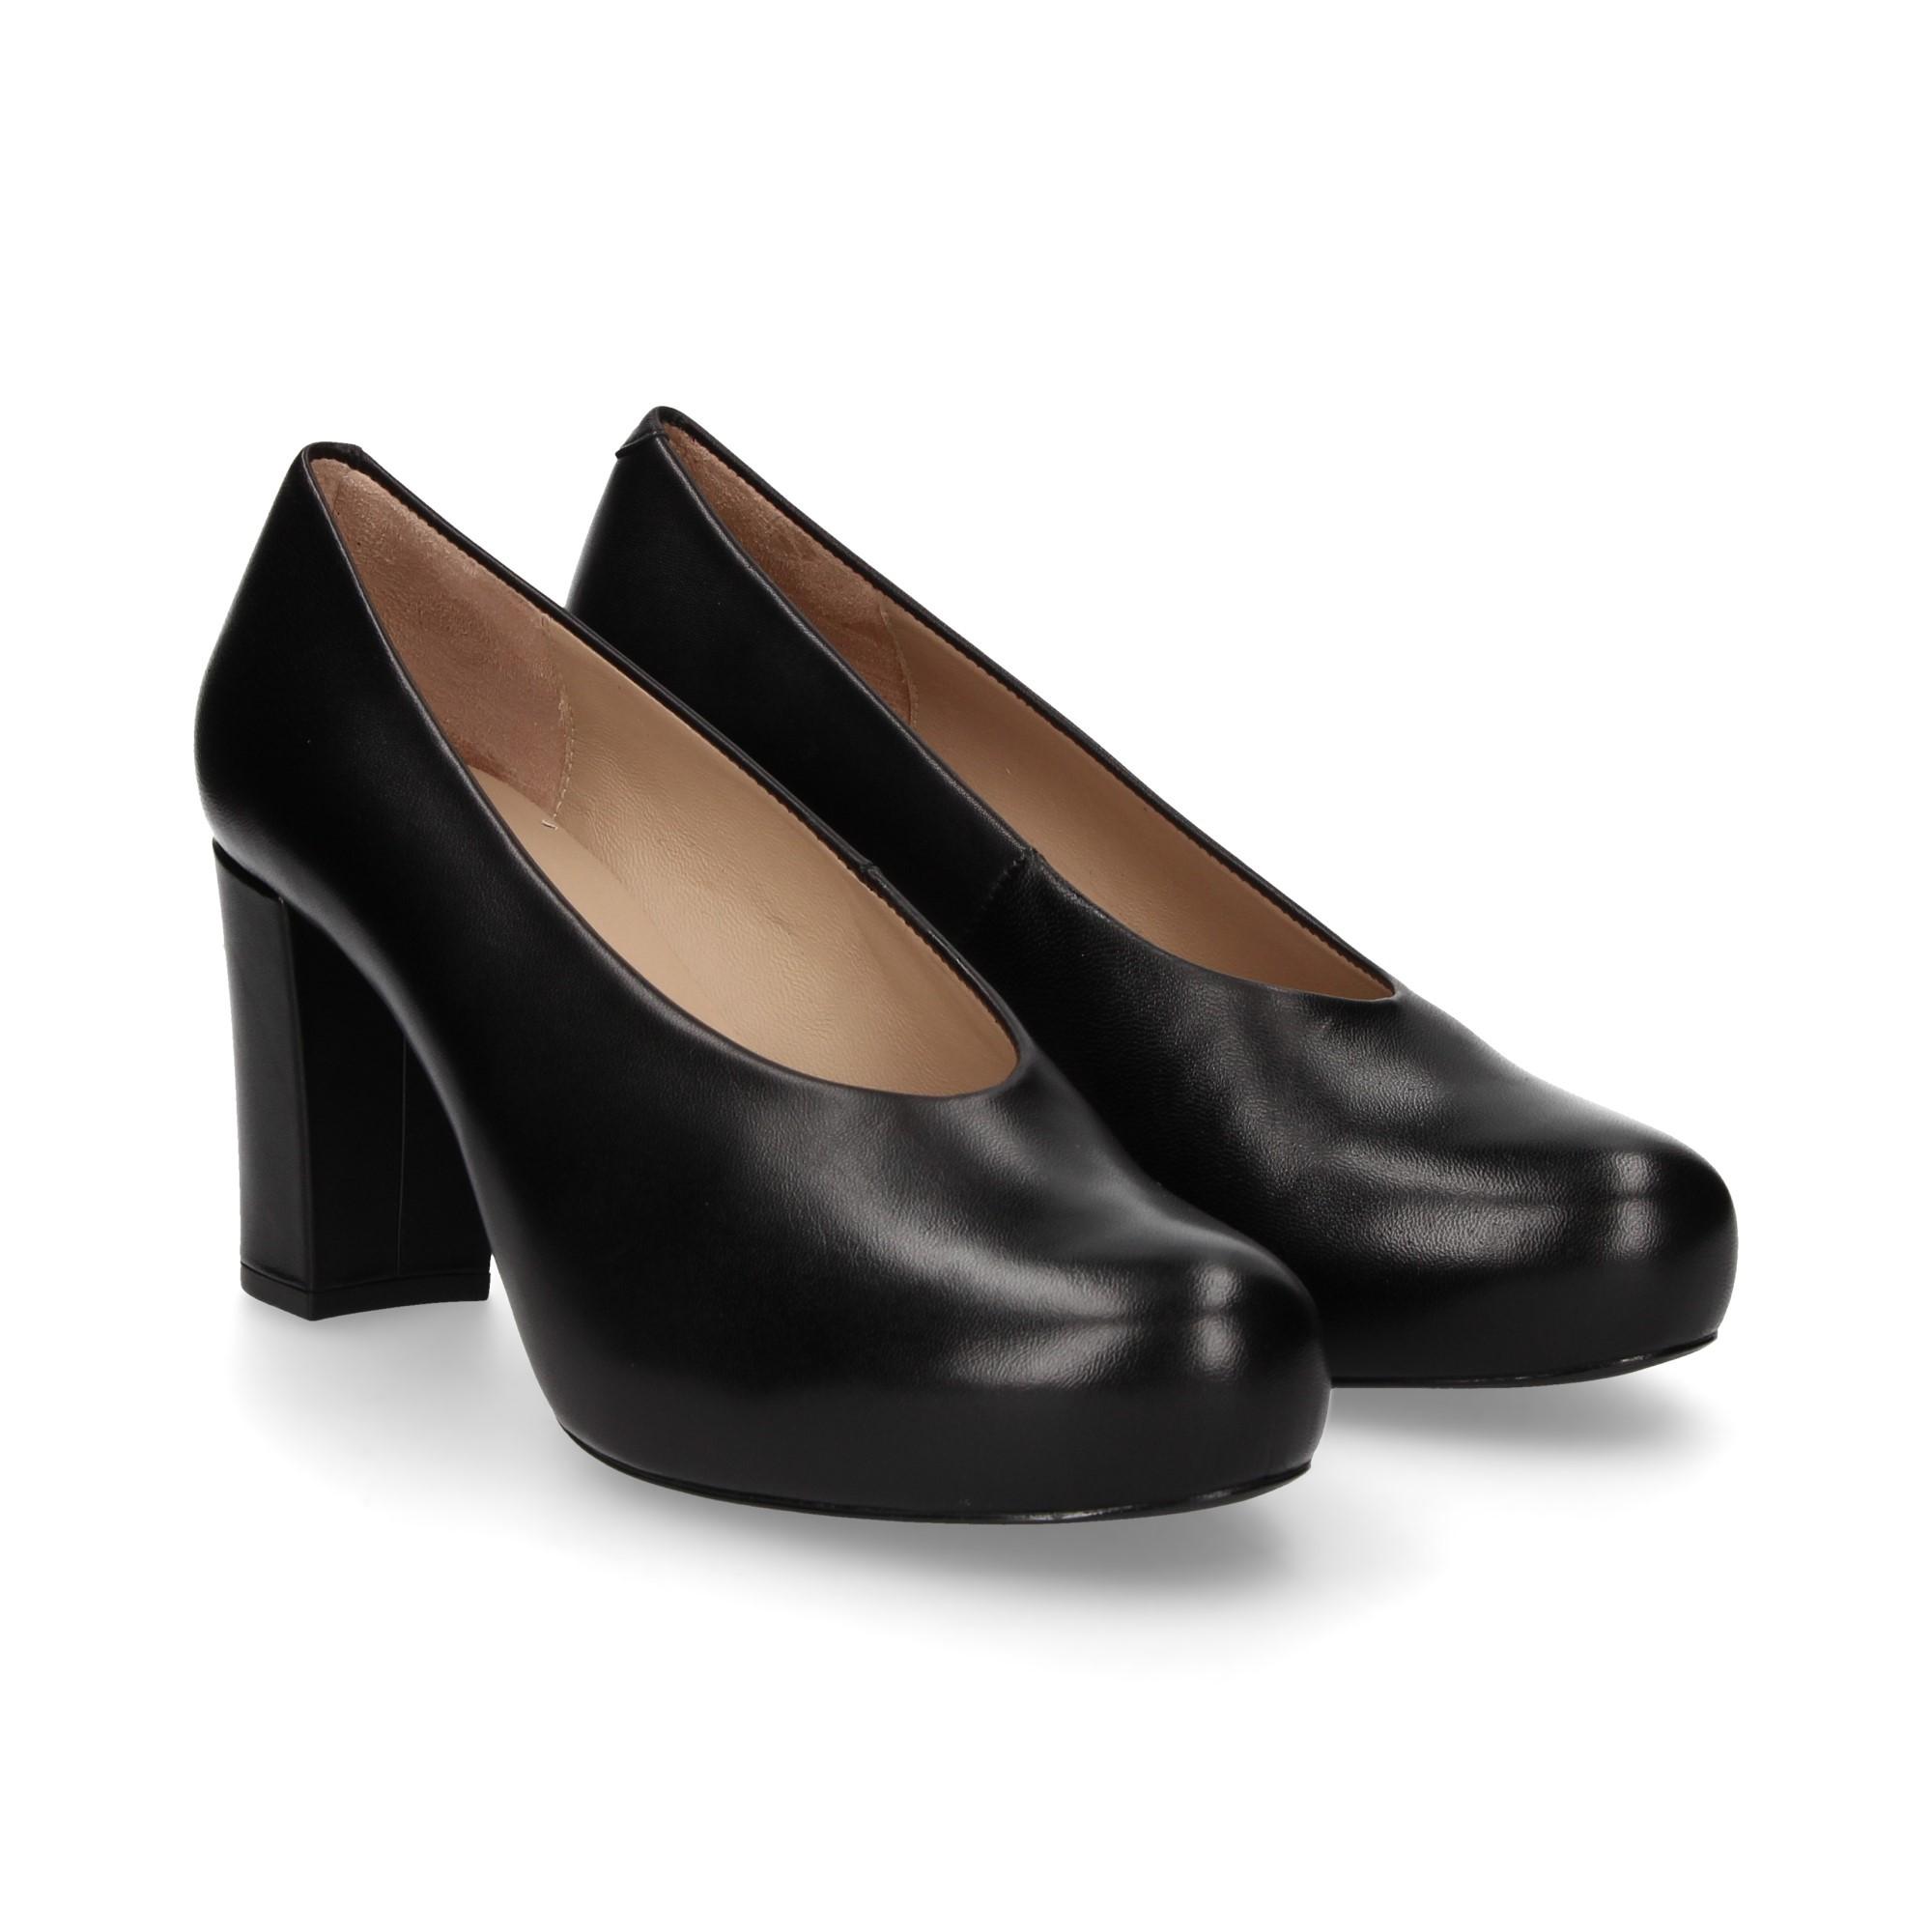 Zapatos Nebula Unisa Salón Black De f1 Negro n08PwkXNO